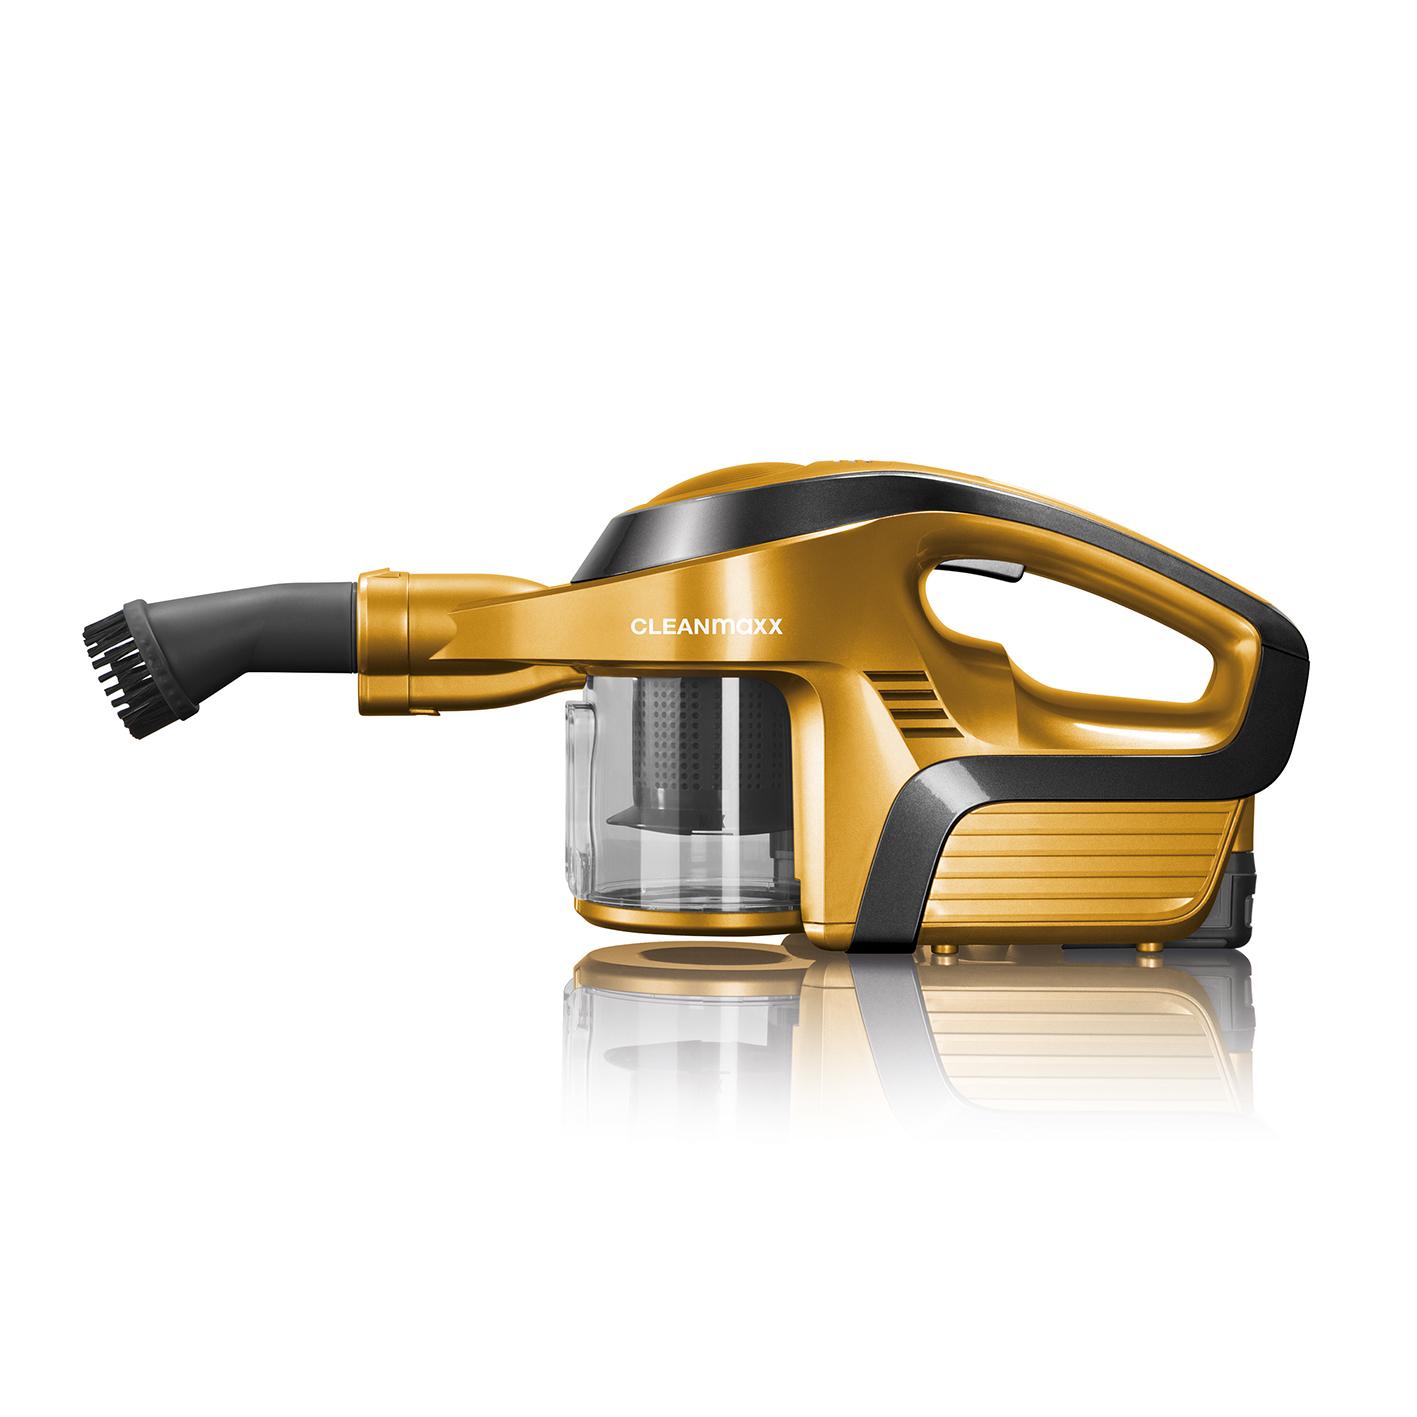 cleanmaxx akku zyklon staubsauger gold gelenkrohr elektr turbod se beutellos ebay. Black Bedroom Furniture Sets. Home Design Ideas